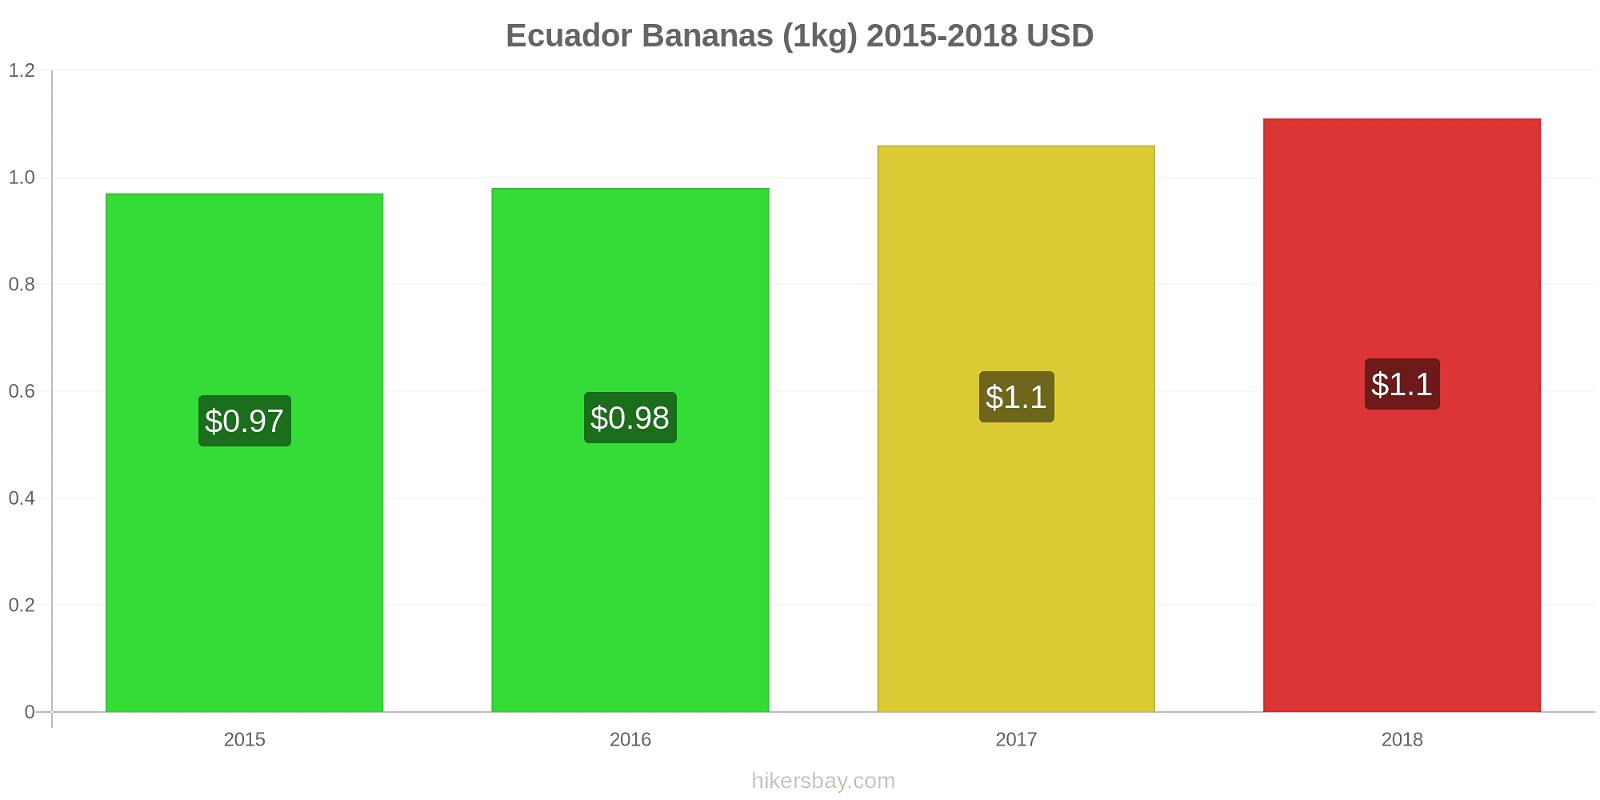 Ecuador price changes Bananas (1kg) hikersbay.com